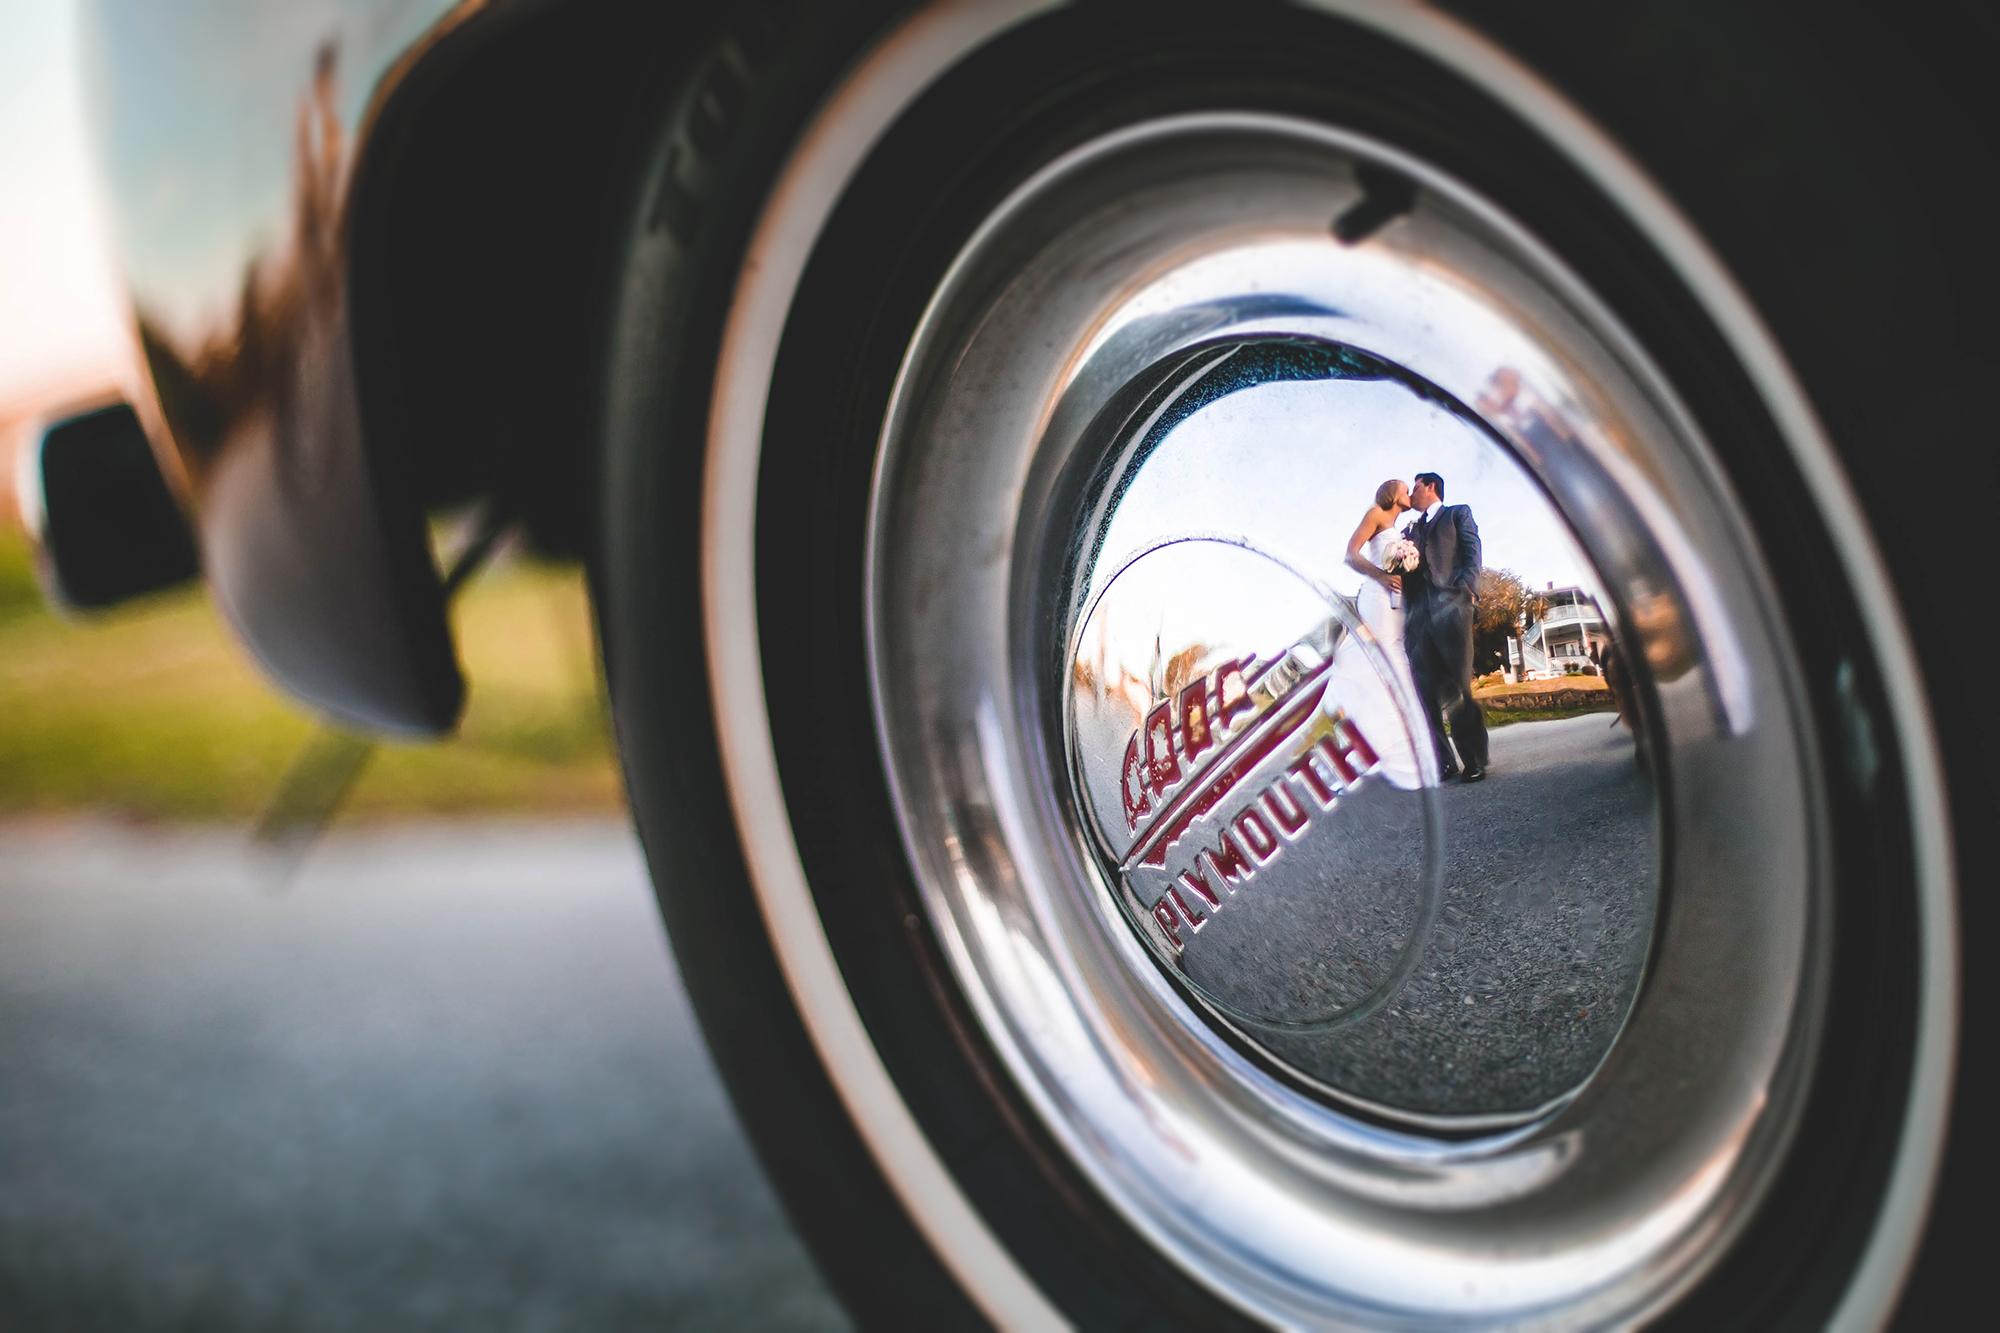 adam-szarmack-wedding-bride-groom-hubcap-reflection.jpg